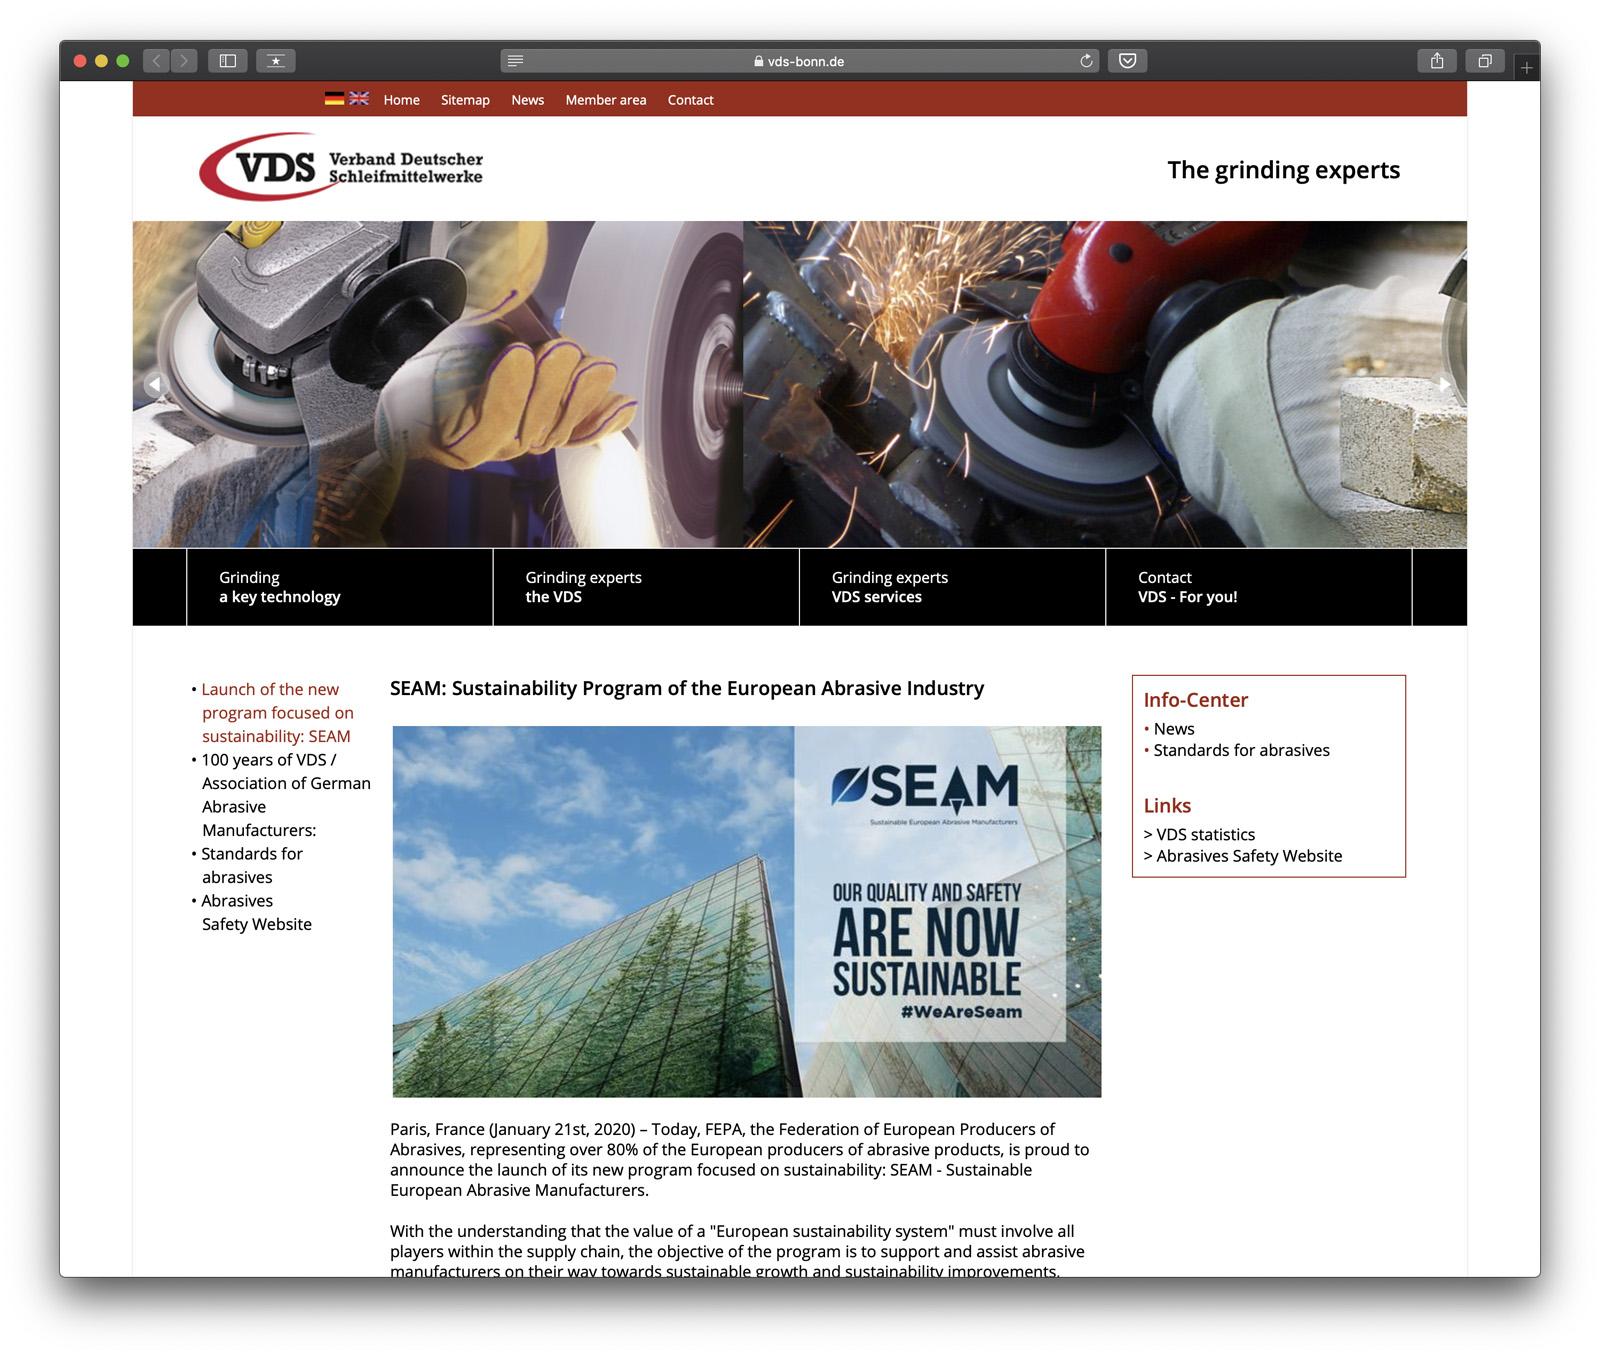 SEAM: Sustainability Program of the European Abrasive Industry